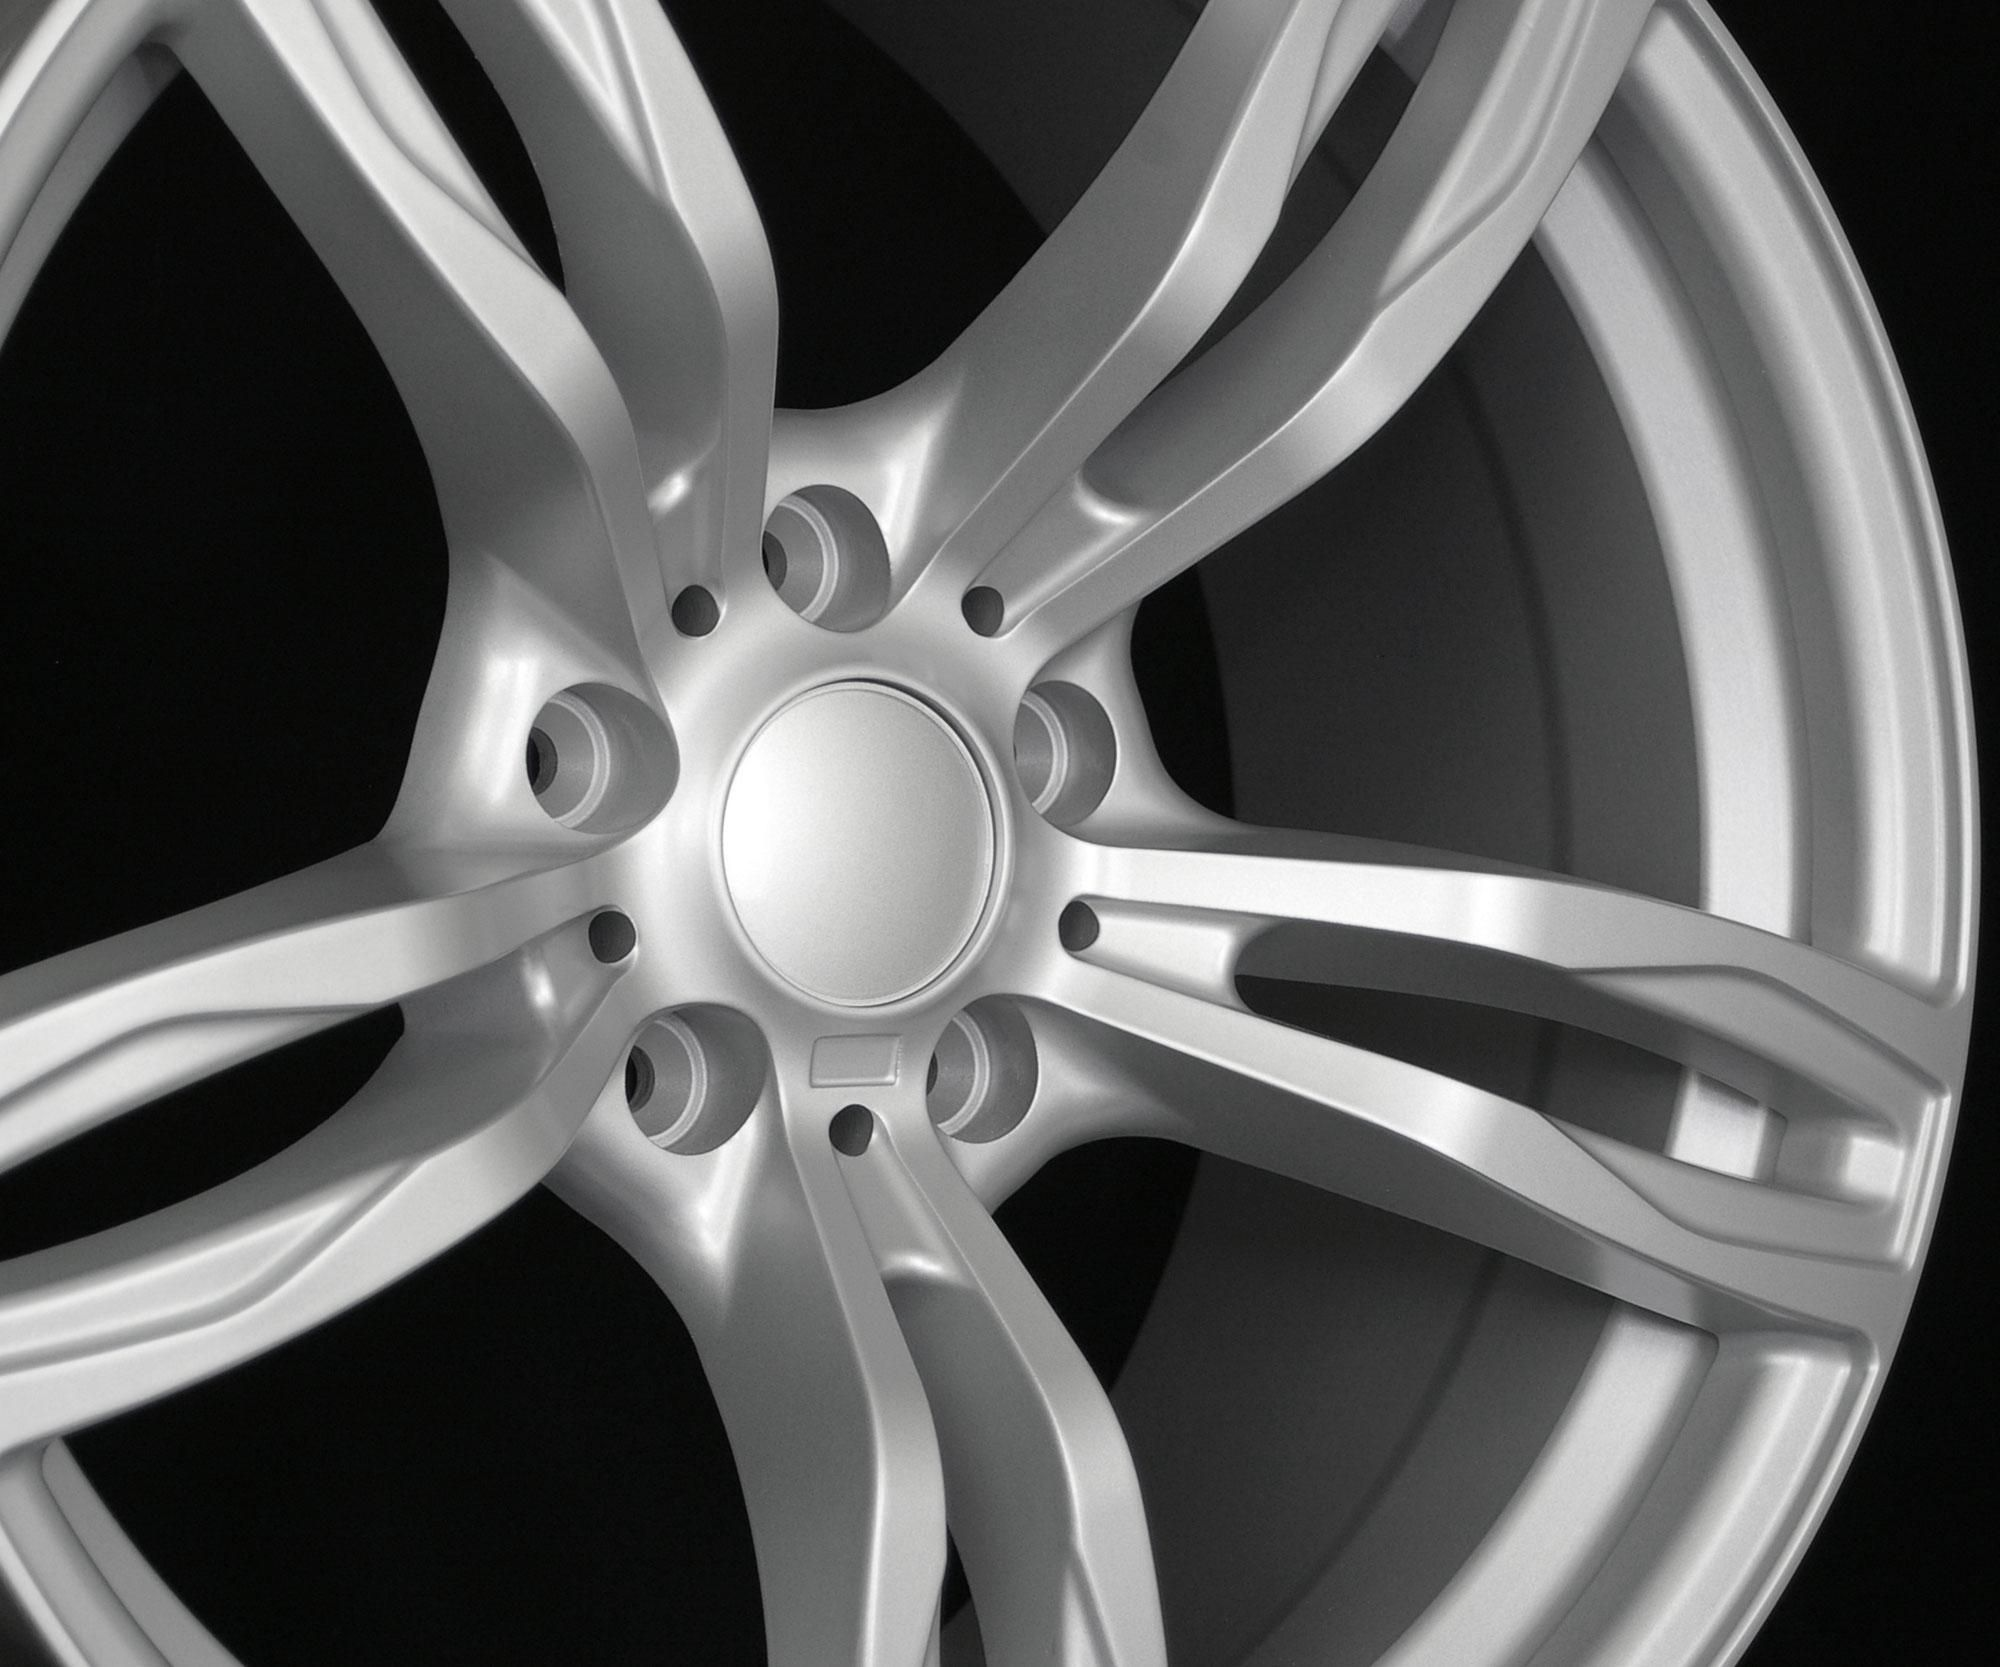 18 M5 Style Wheels Rims Fit BMW 3 Series 323i 325i 328i 330i 335i Z4